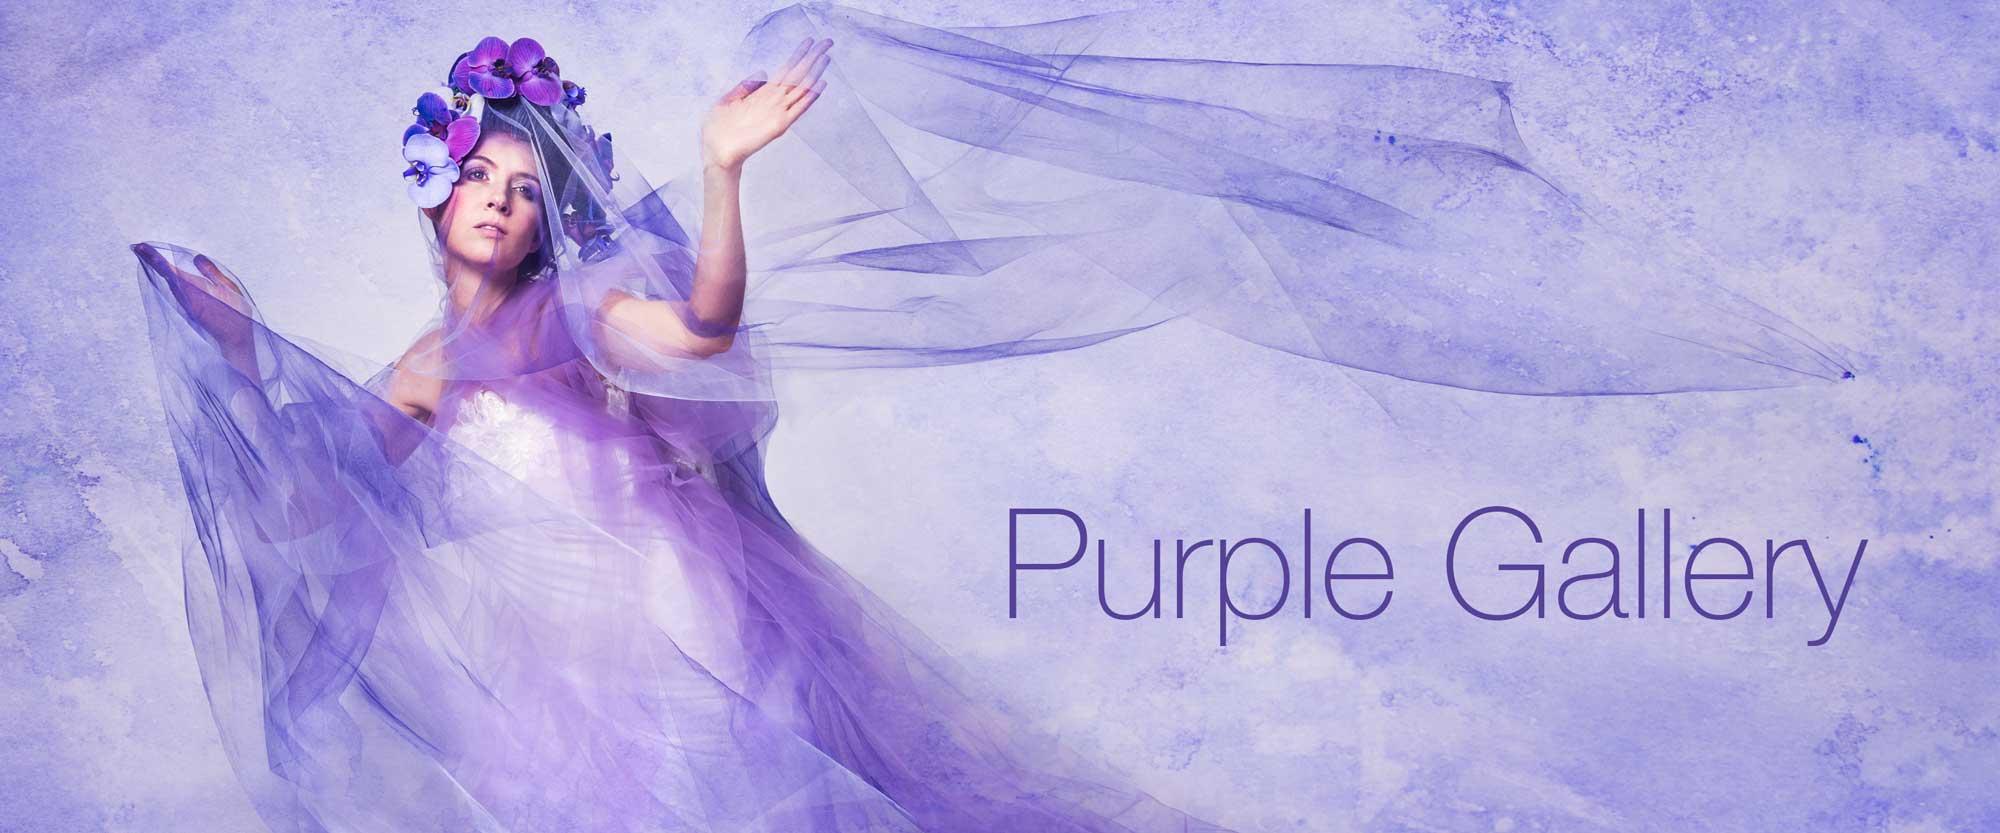 Laüra Hollick's Purple Gallery